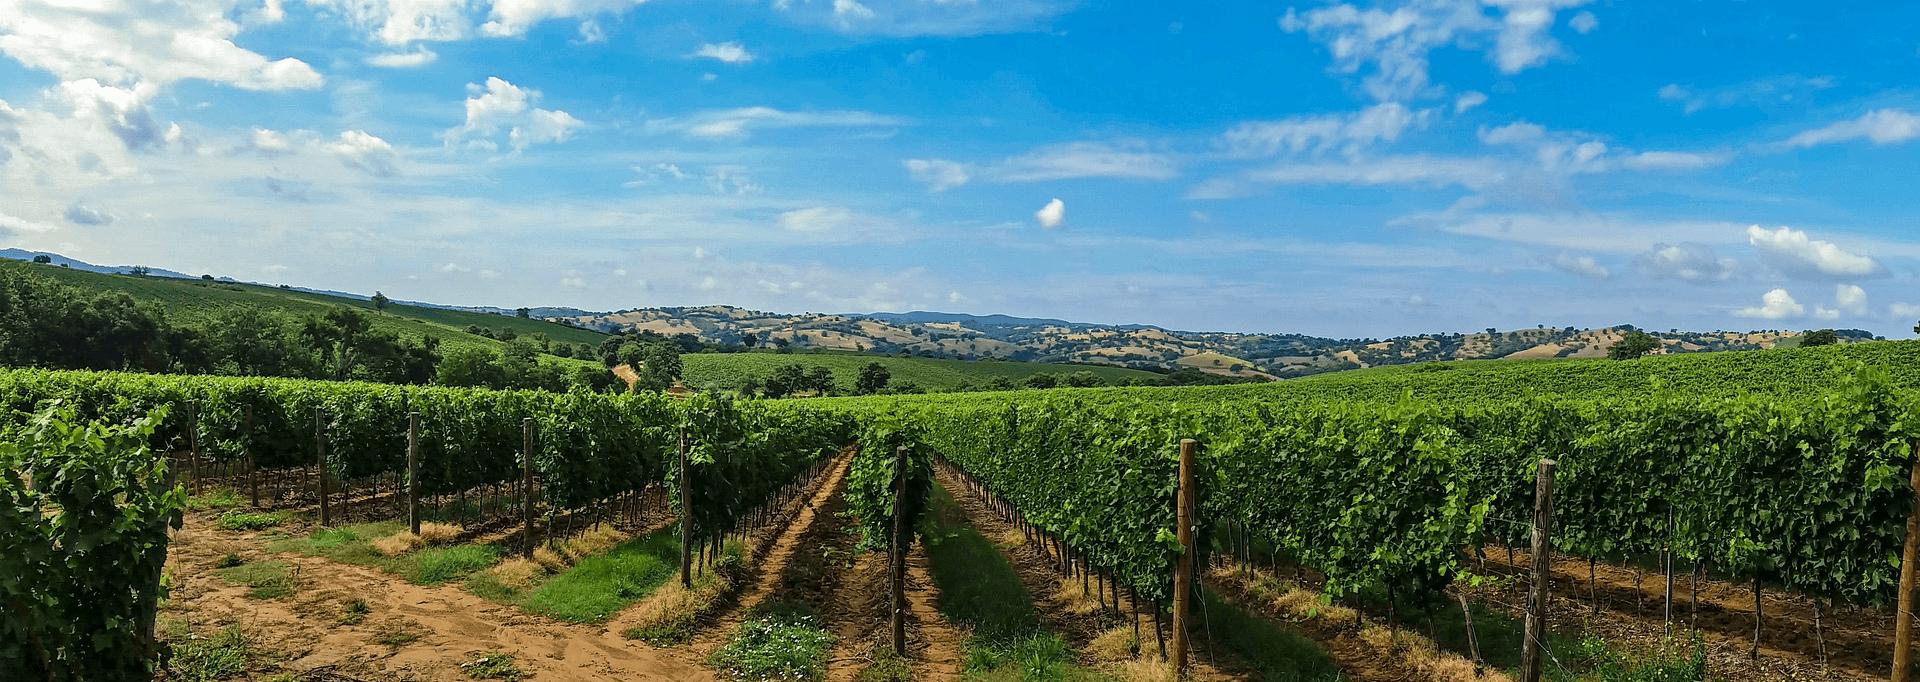 Popular Wine Regions